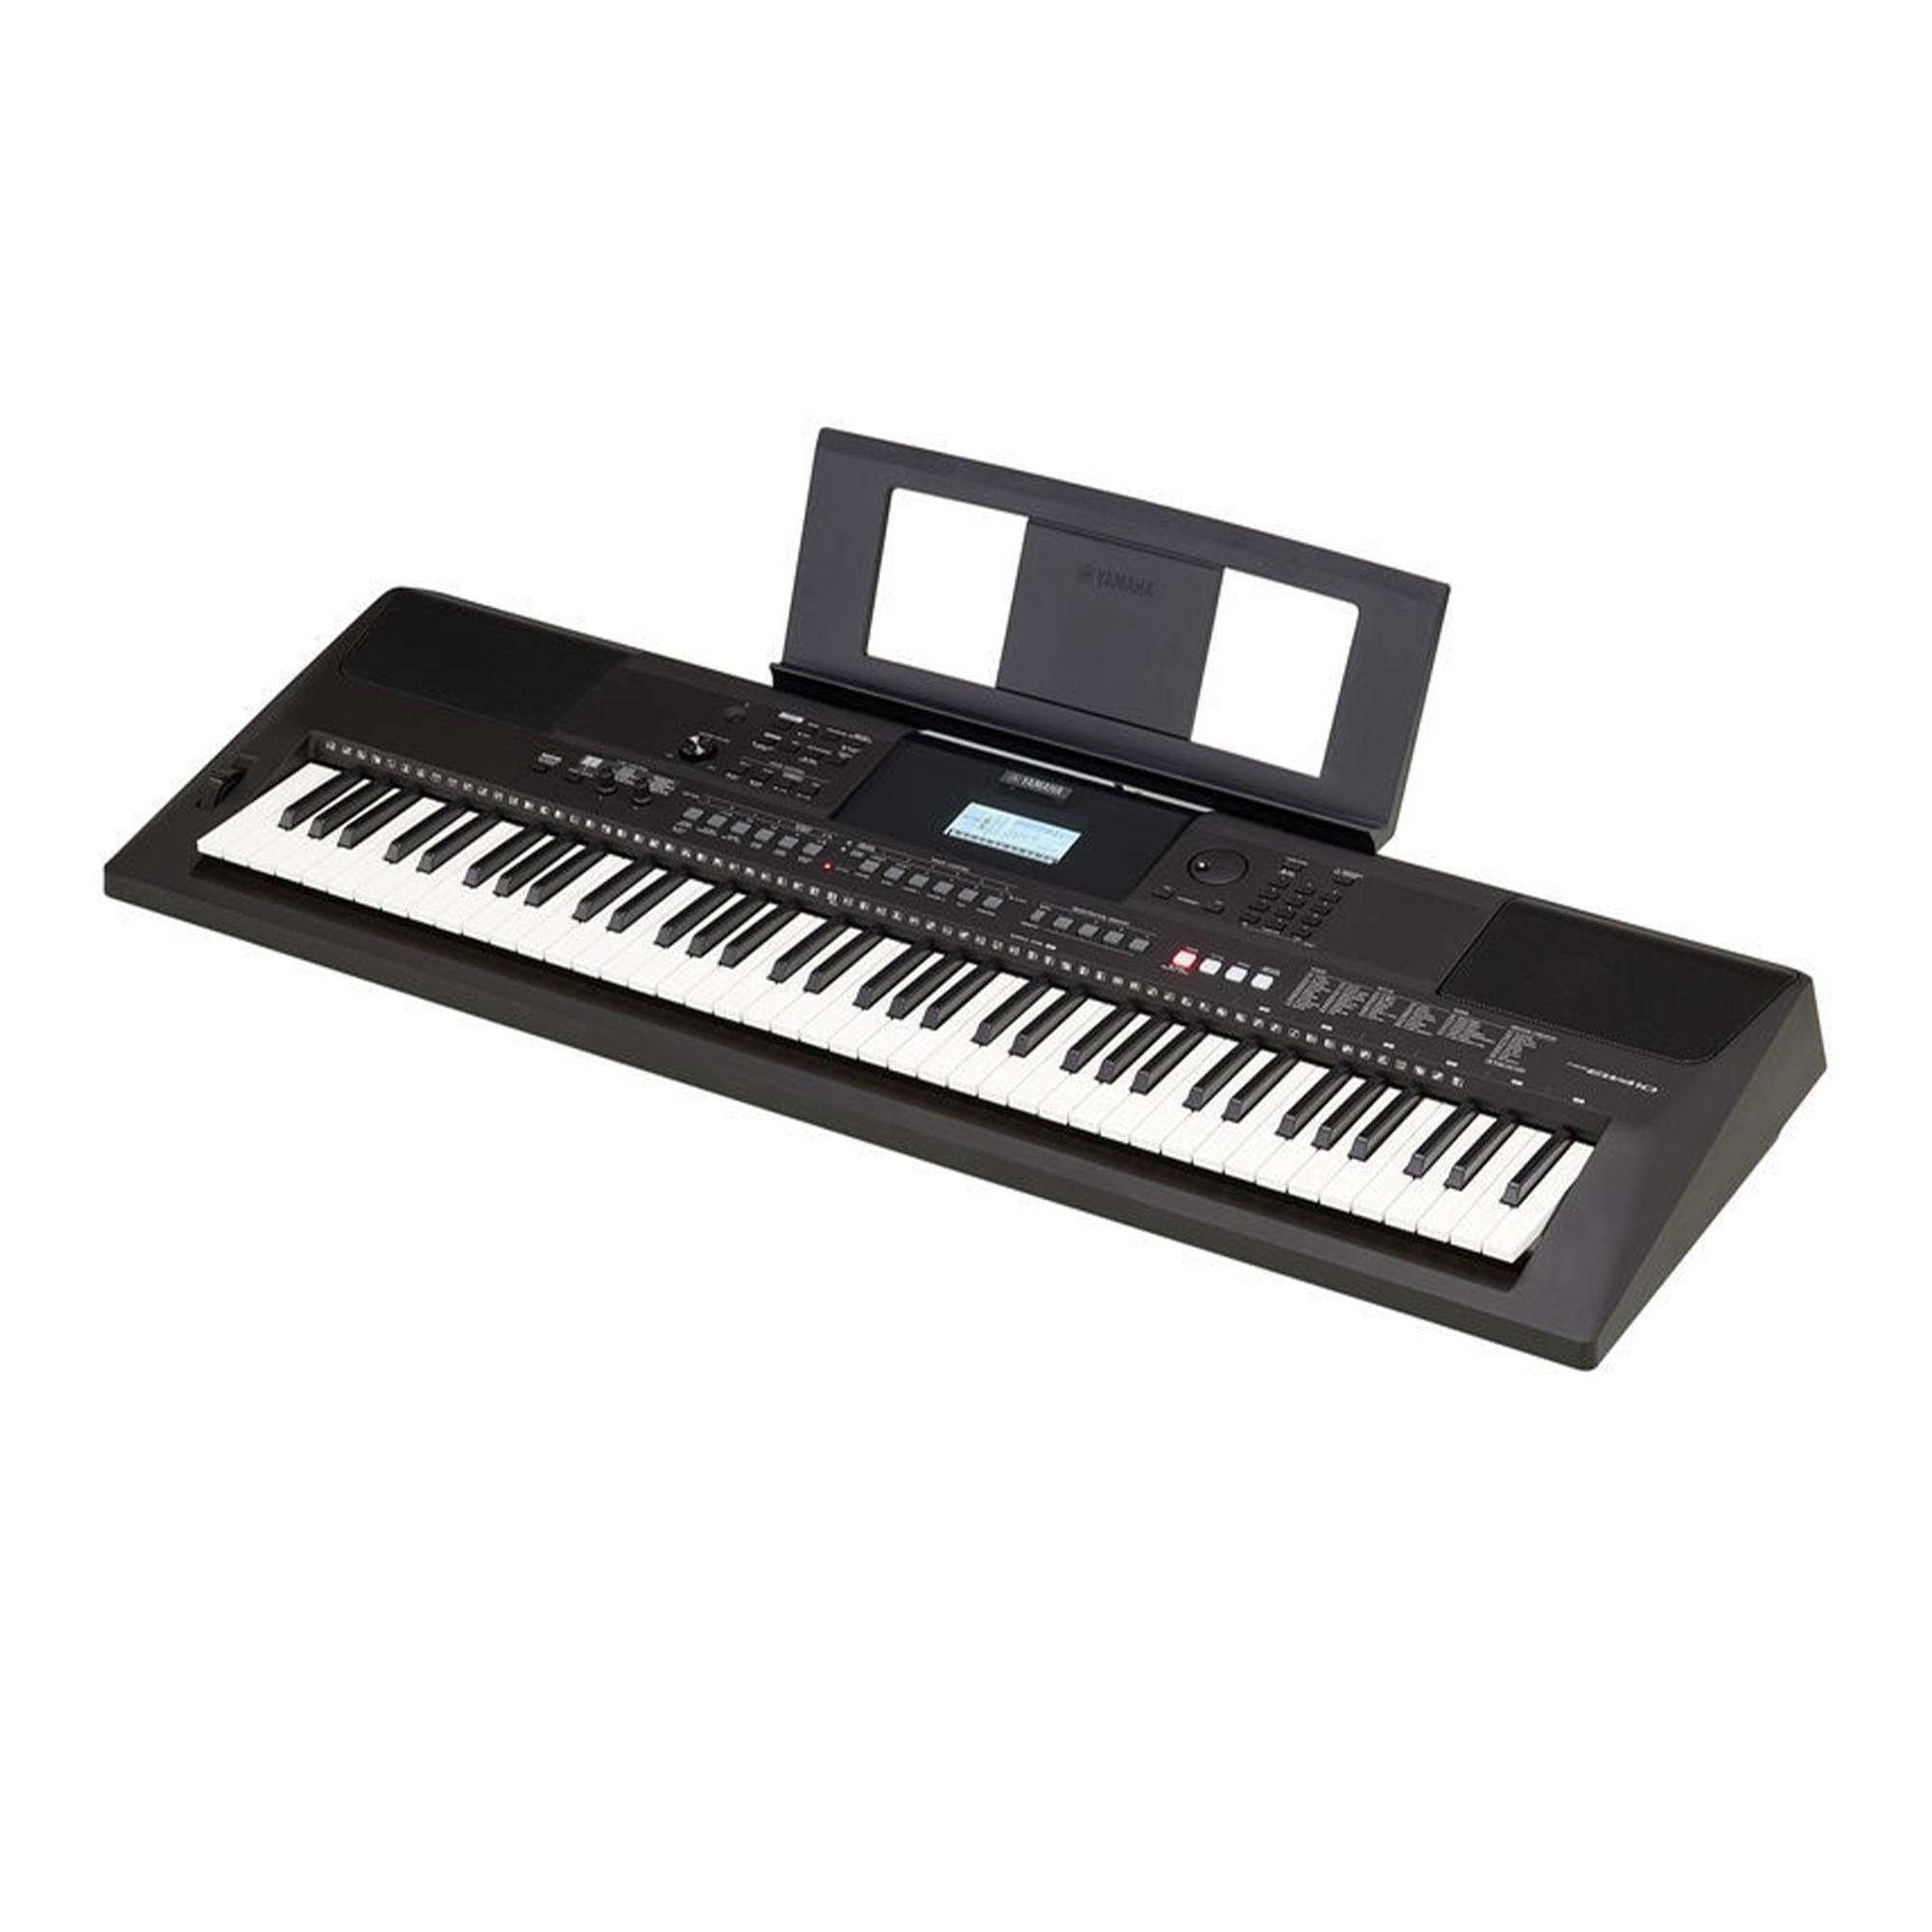 Yamaha Psrew410 Digital 76 Keys Keyboard With Touch in Yamaha Singapore Calendar